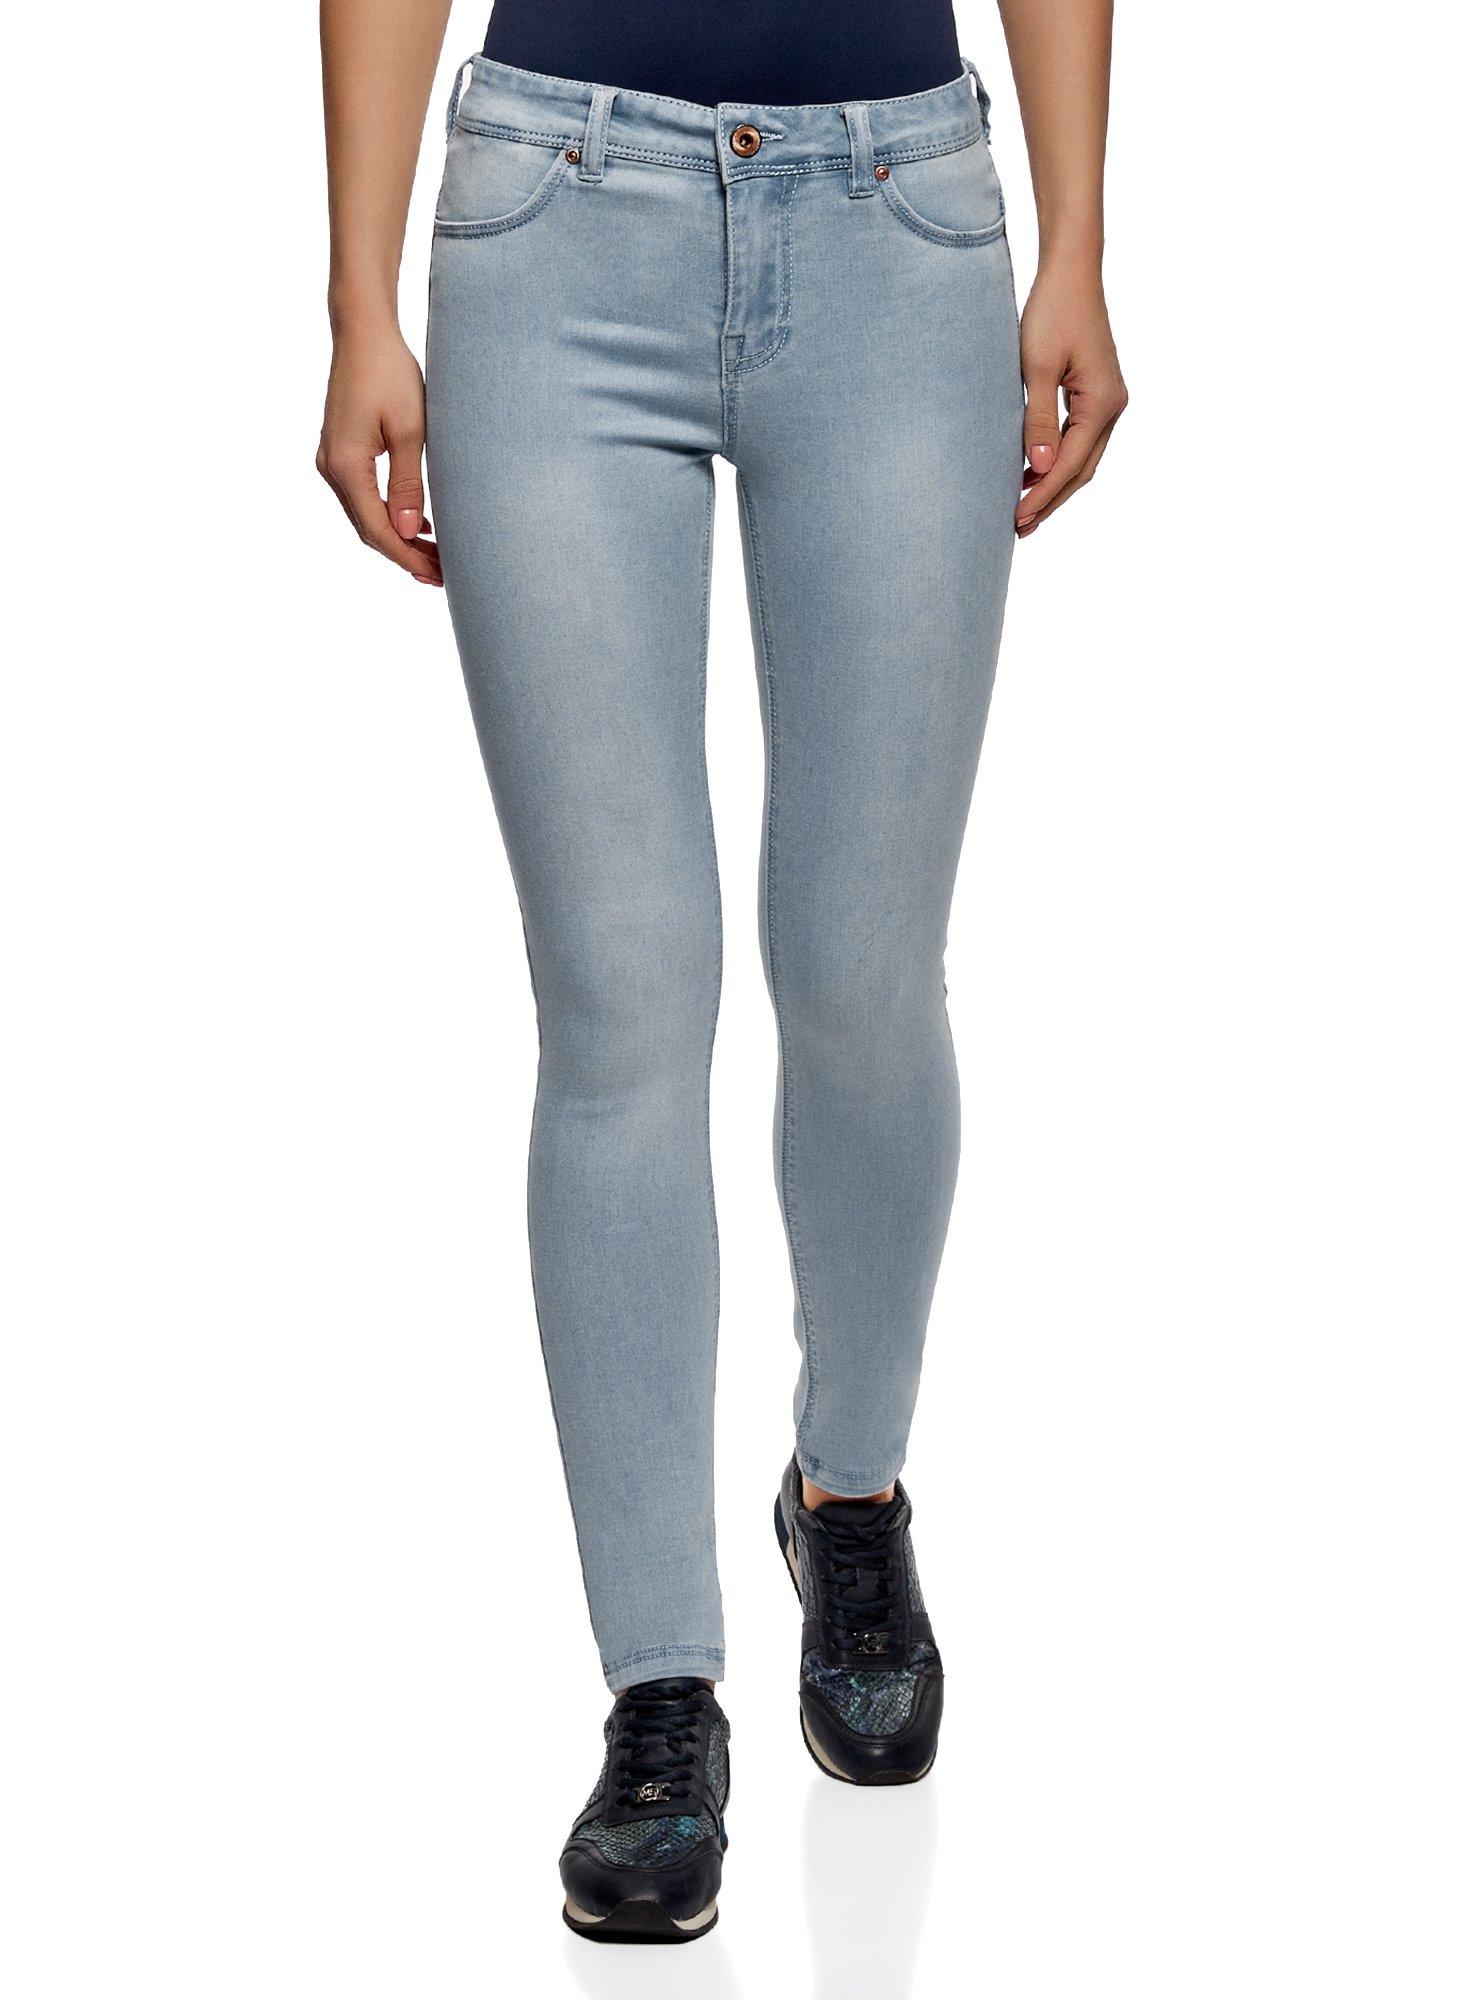 oodji Ultra Women's Skinny Jeans in Soft Fabric, Blue, 28W / 32L (US 6 / EU 40 / M)